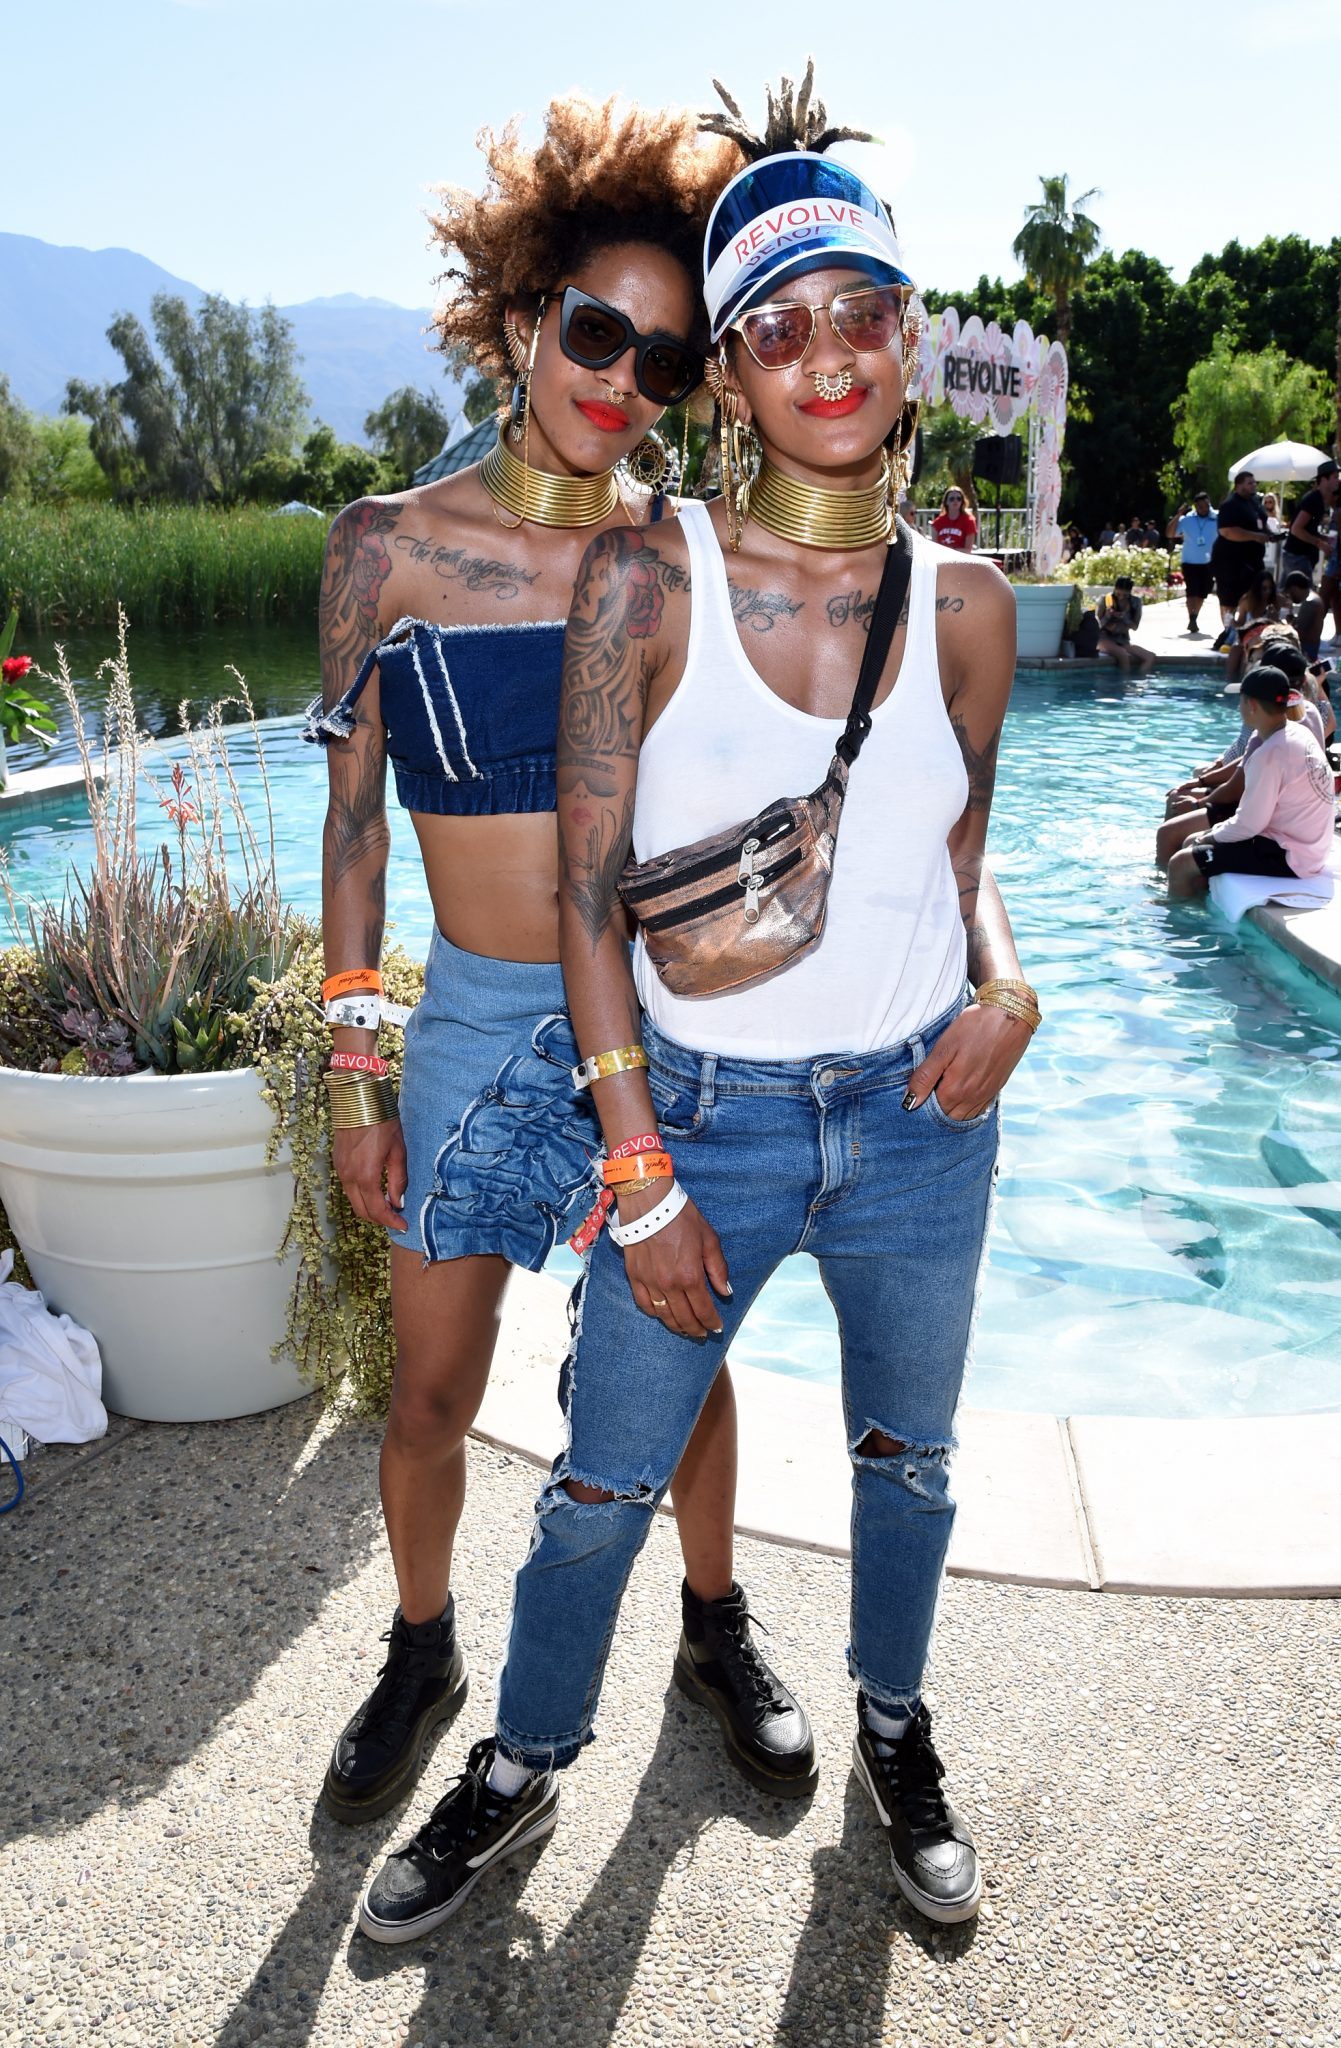 Day 2 Revolve Festival At Coachella With Moët & Chandon